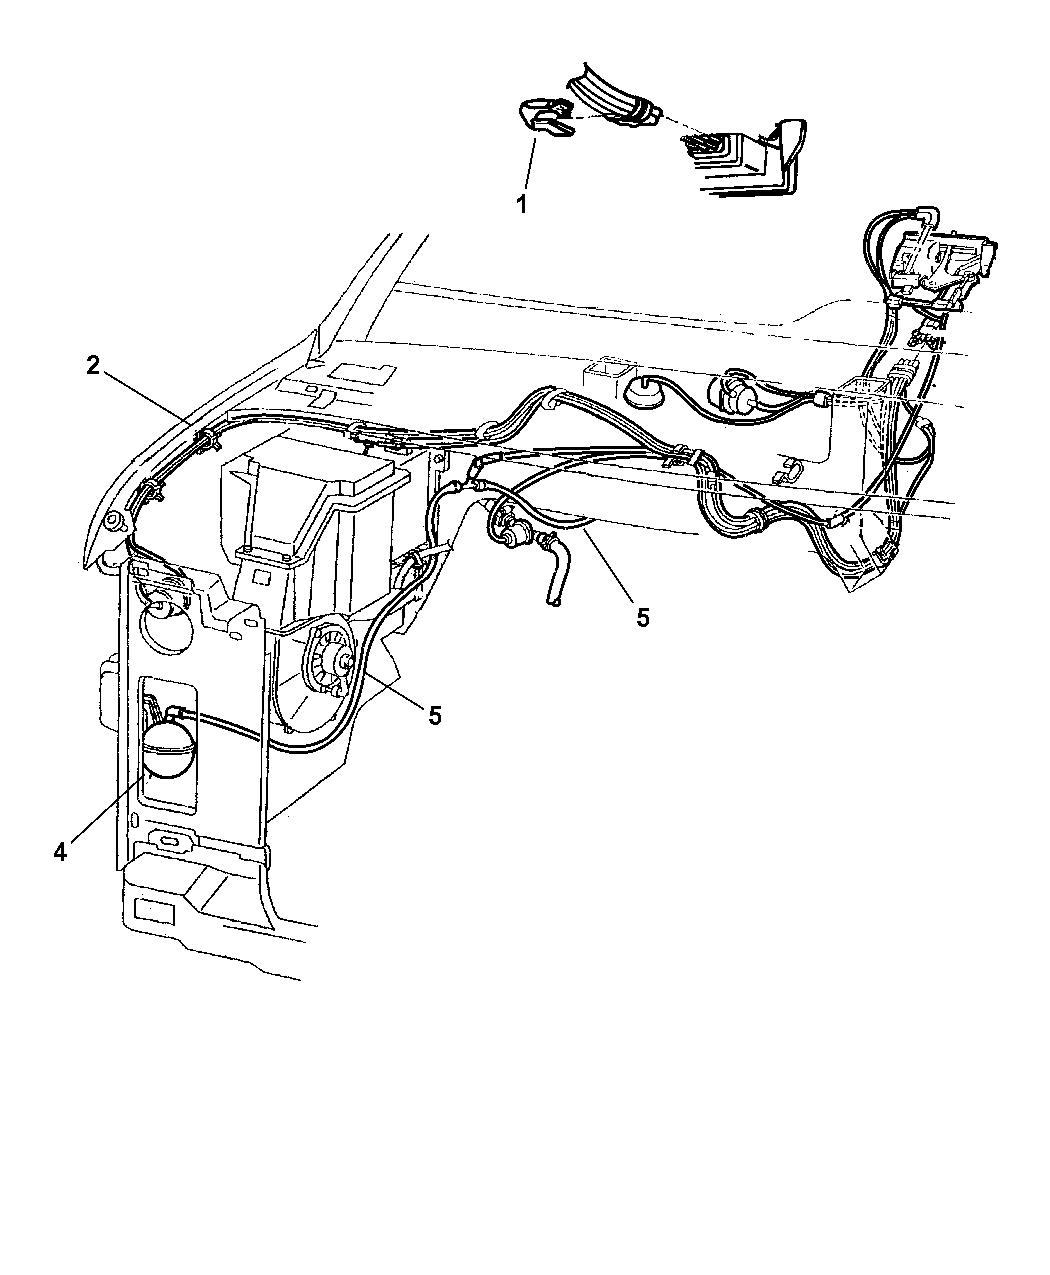 2001 Dodge Ram 2500 Diesel Vacuum Diagram - AtkinsjewelryAtkinsjewelry